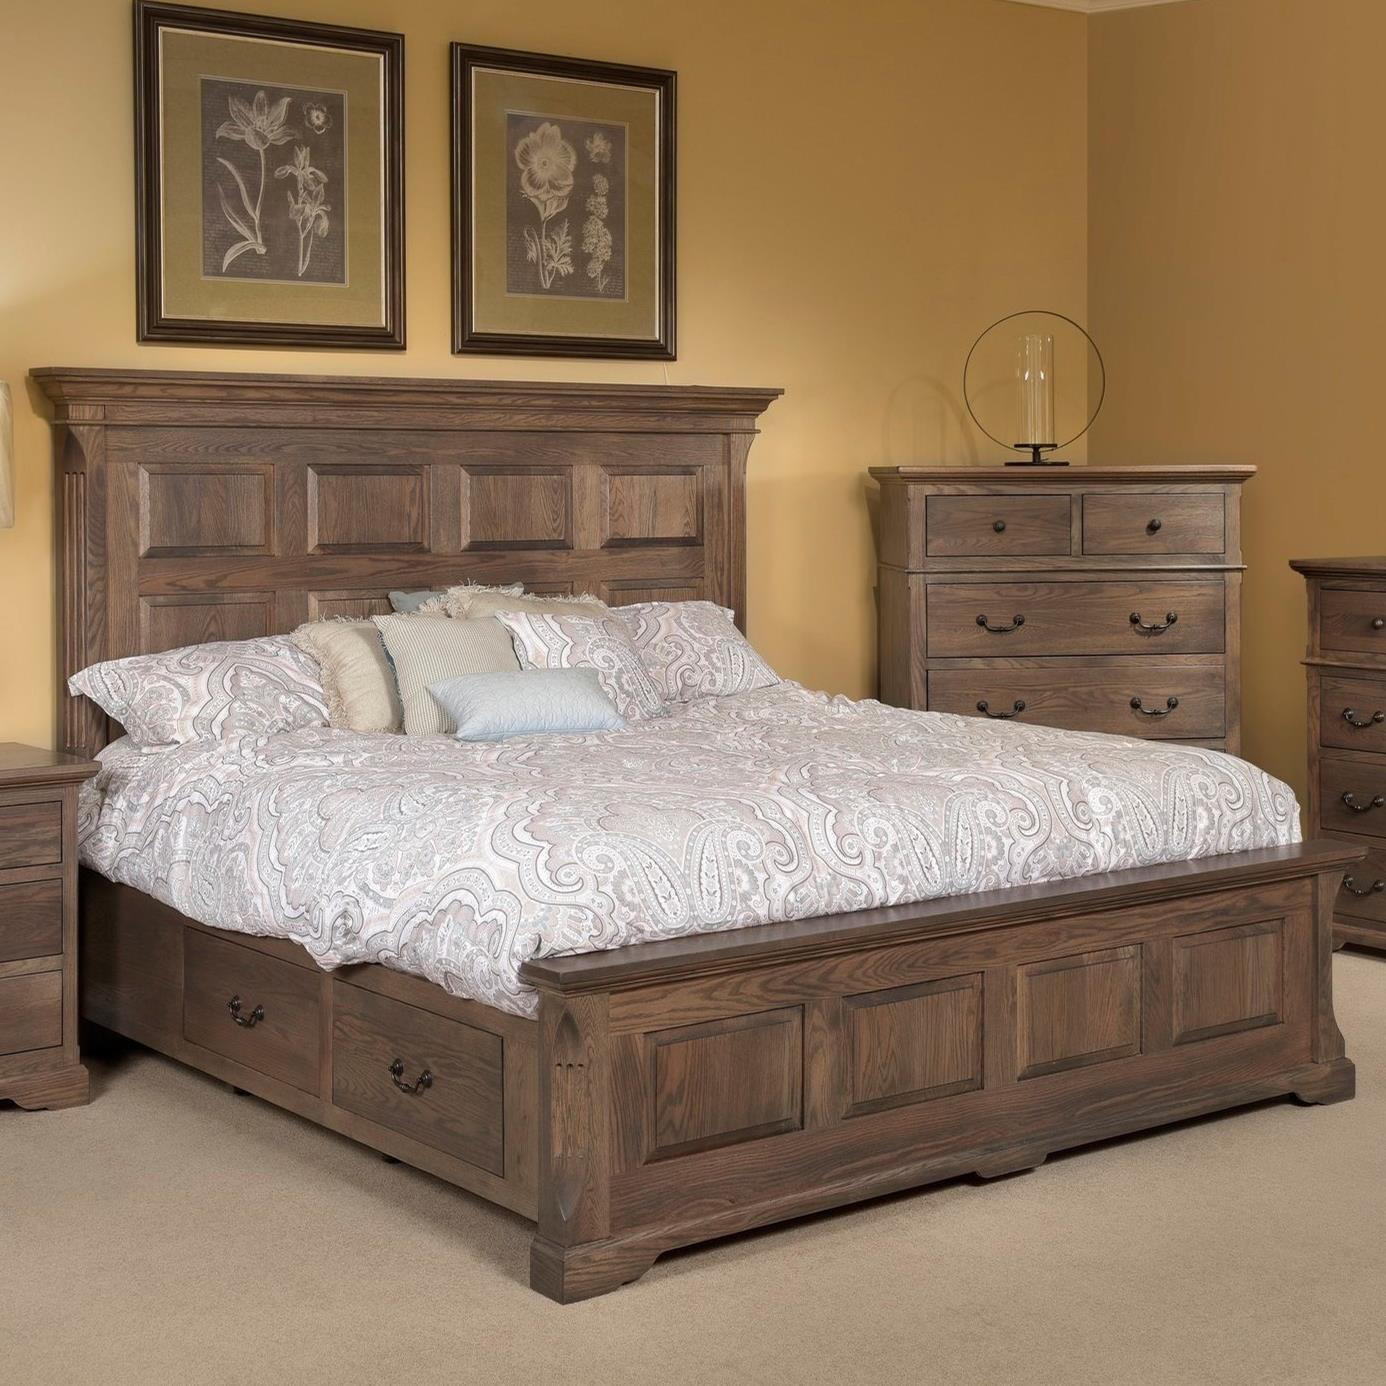 King Size Panel Storage Bed